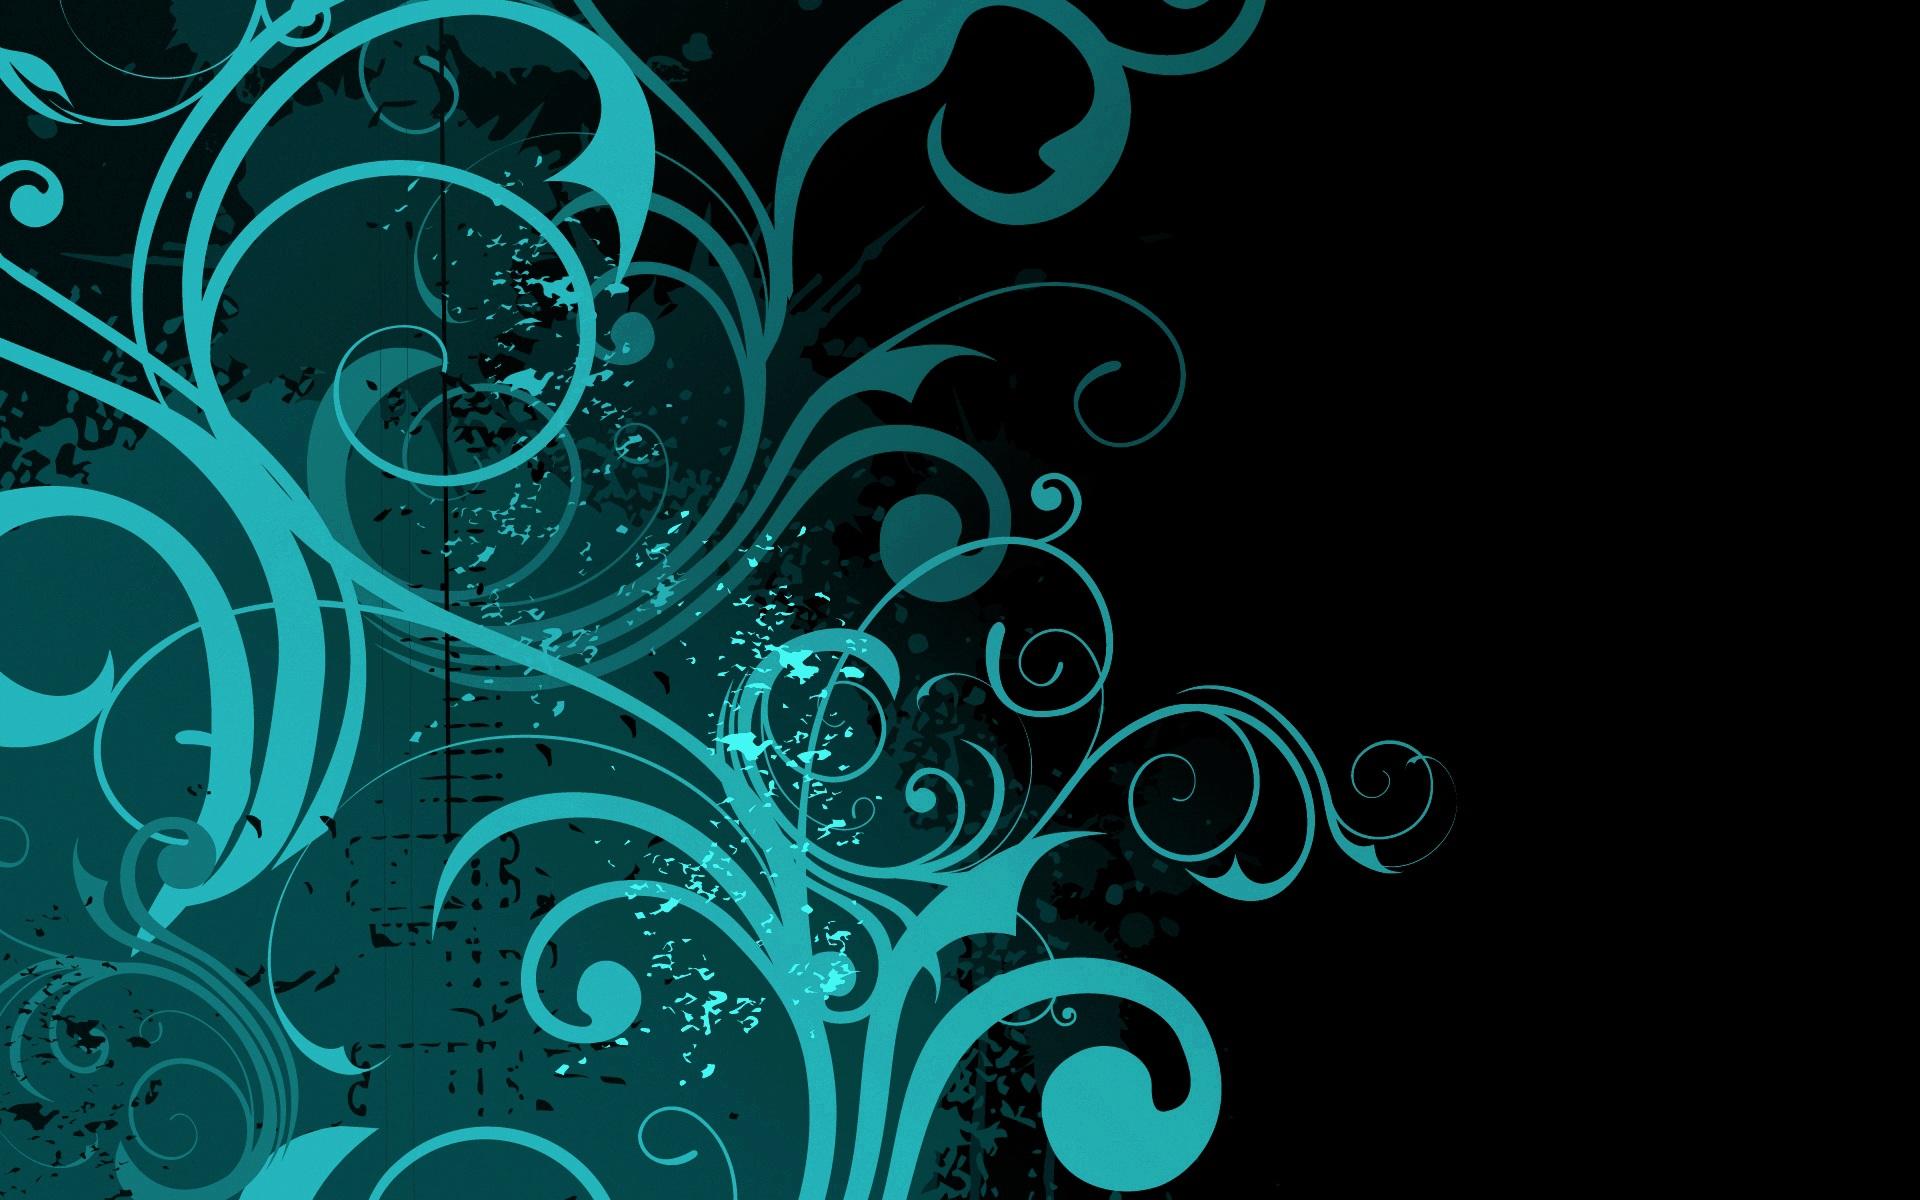 Abstract Floral Desktop Hd Hd Wallpaper